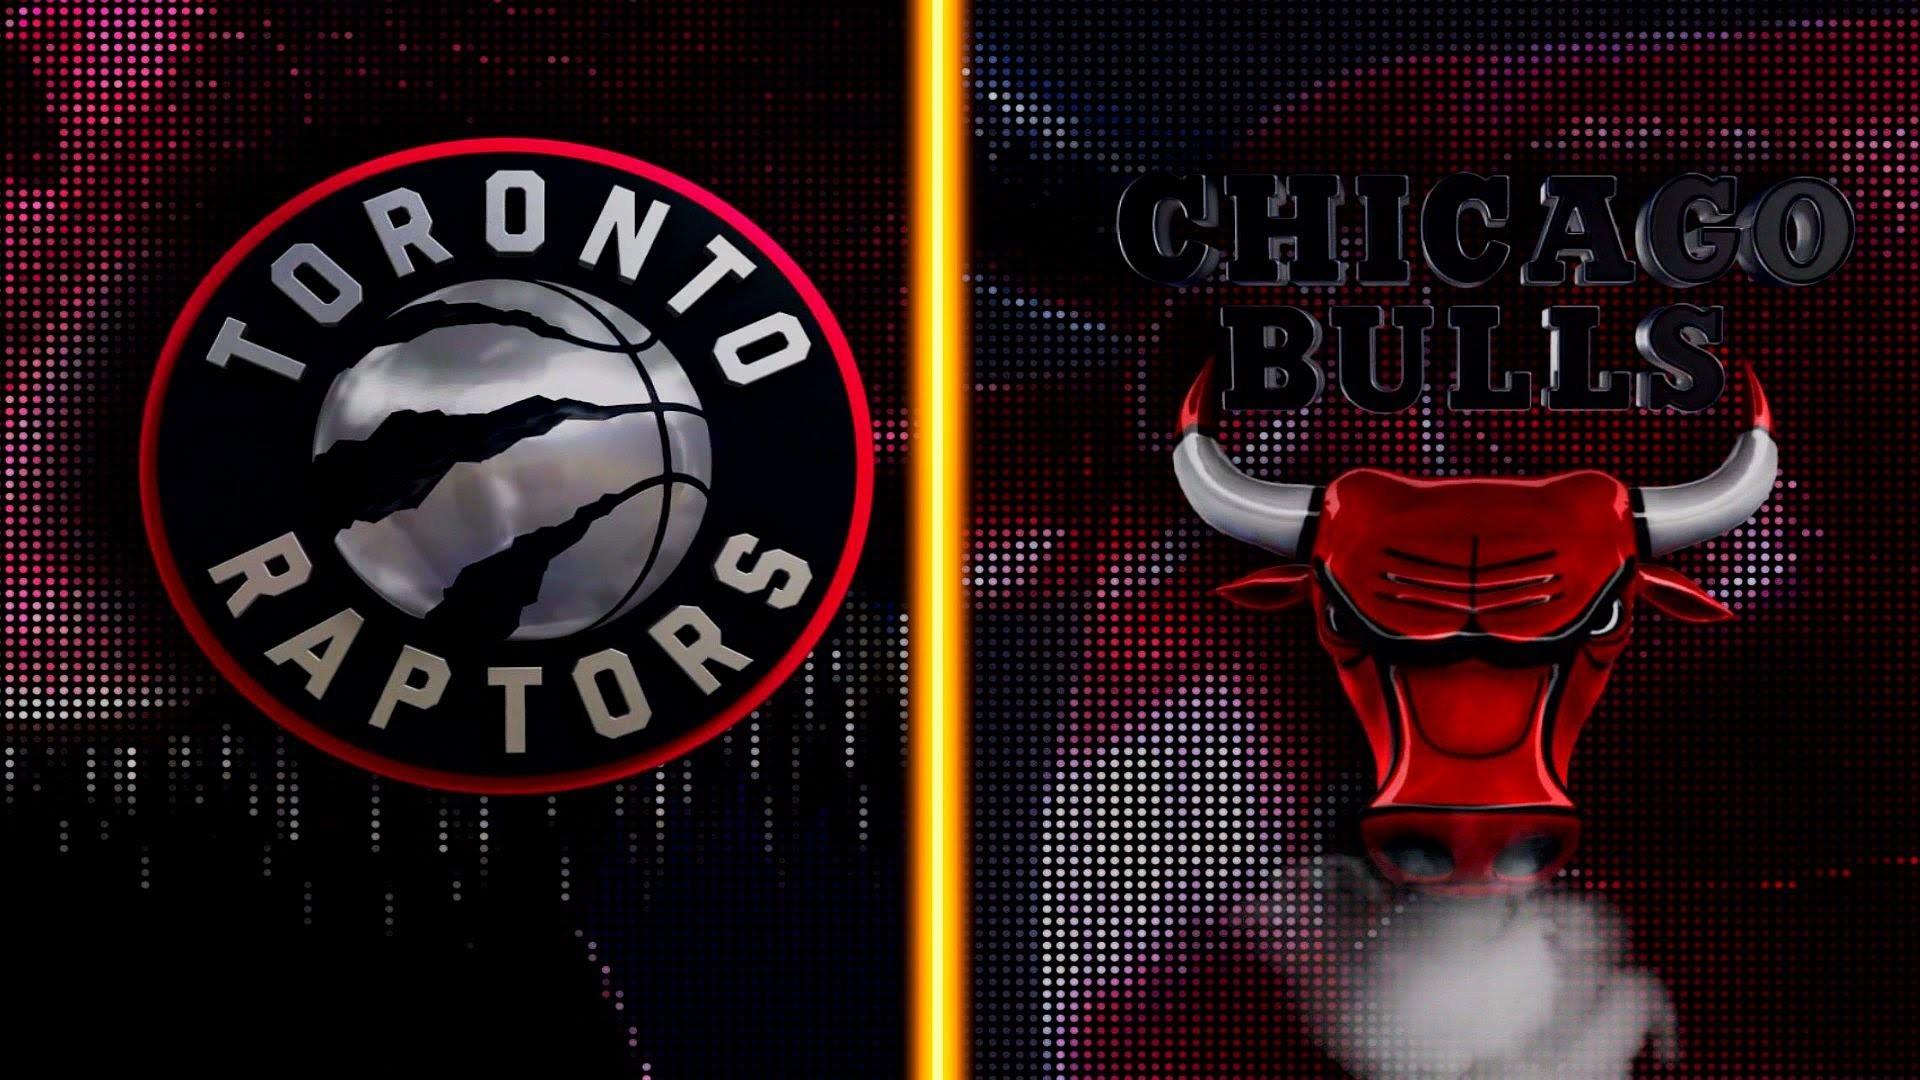 PS4: NBA 2K16 – Toronto Raptors vs. Chicago Bulls [1080p 60 FPS] – YouTube